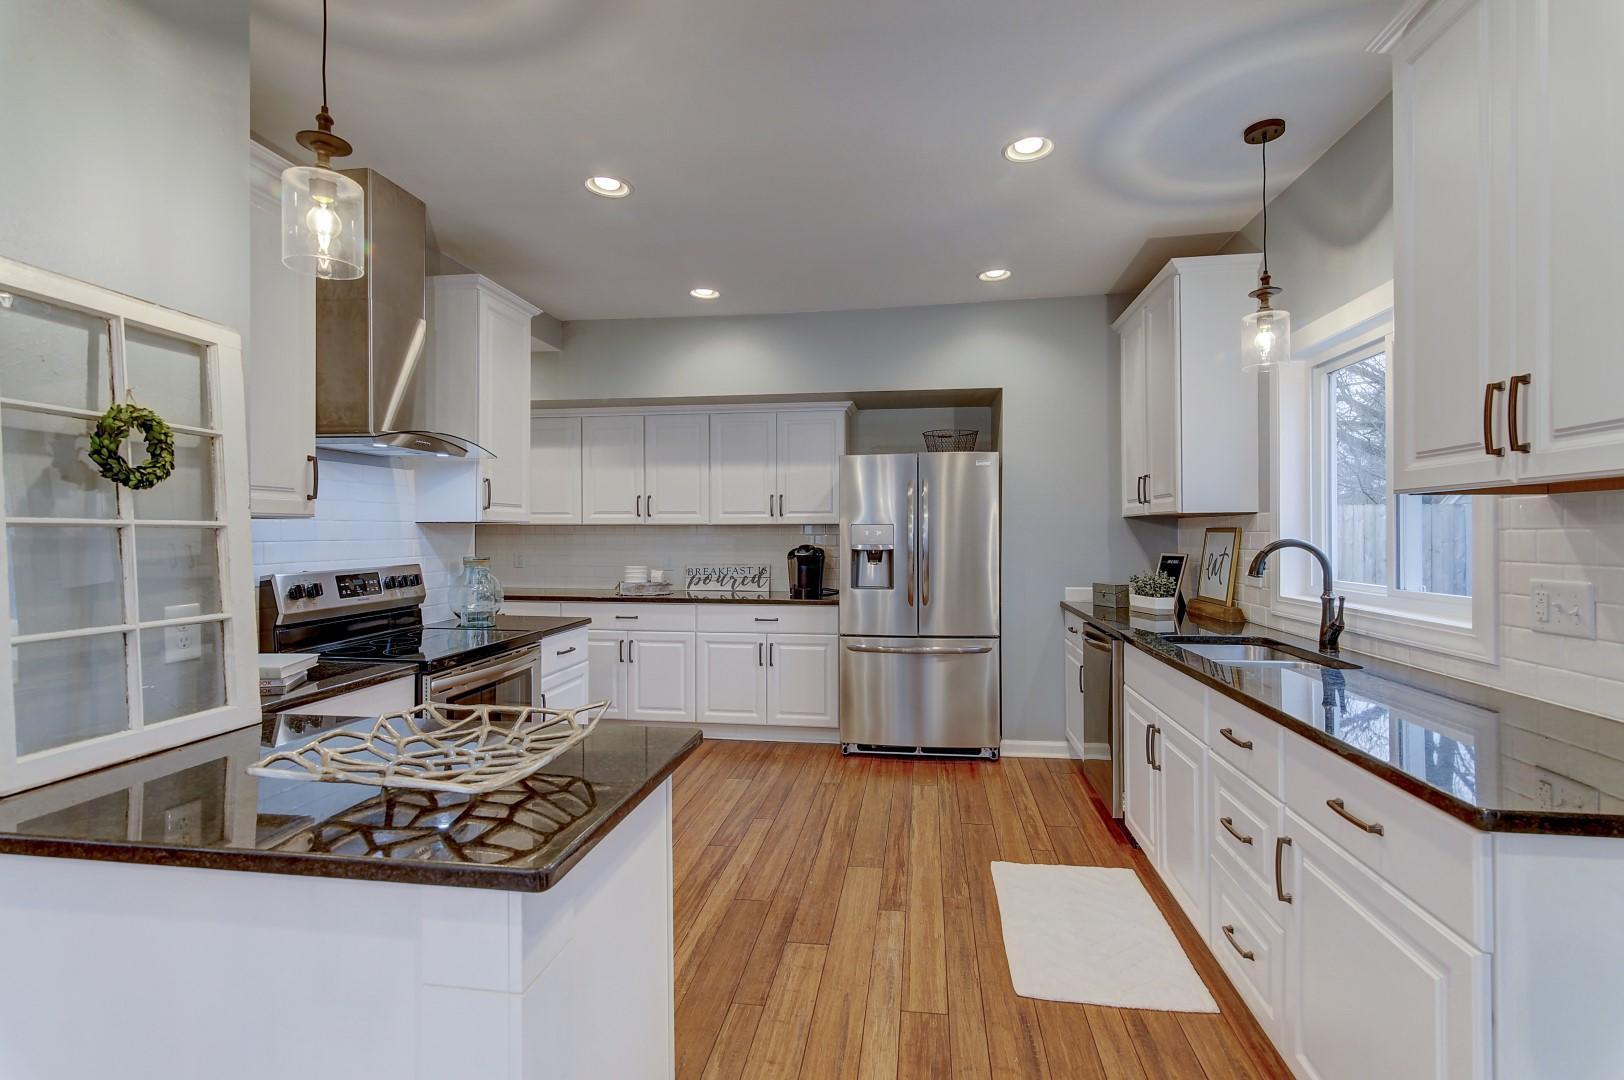 314 Silver Lake St, Oconomowoc, Wisconsin 53066, 4 Bedrooms Bedrooms, ,3 BathroomsBathrooms,Single-Family,For Sale,Silver Lake St,1614538